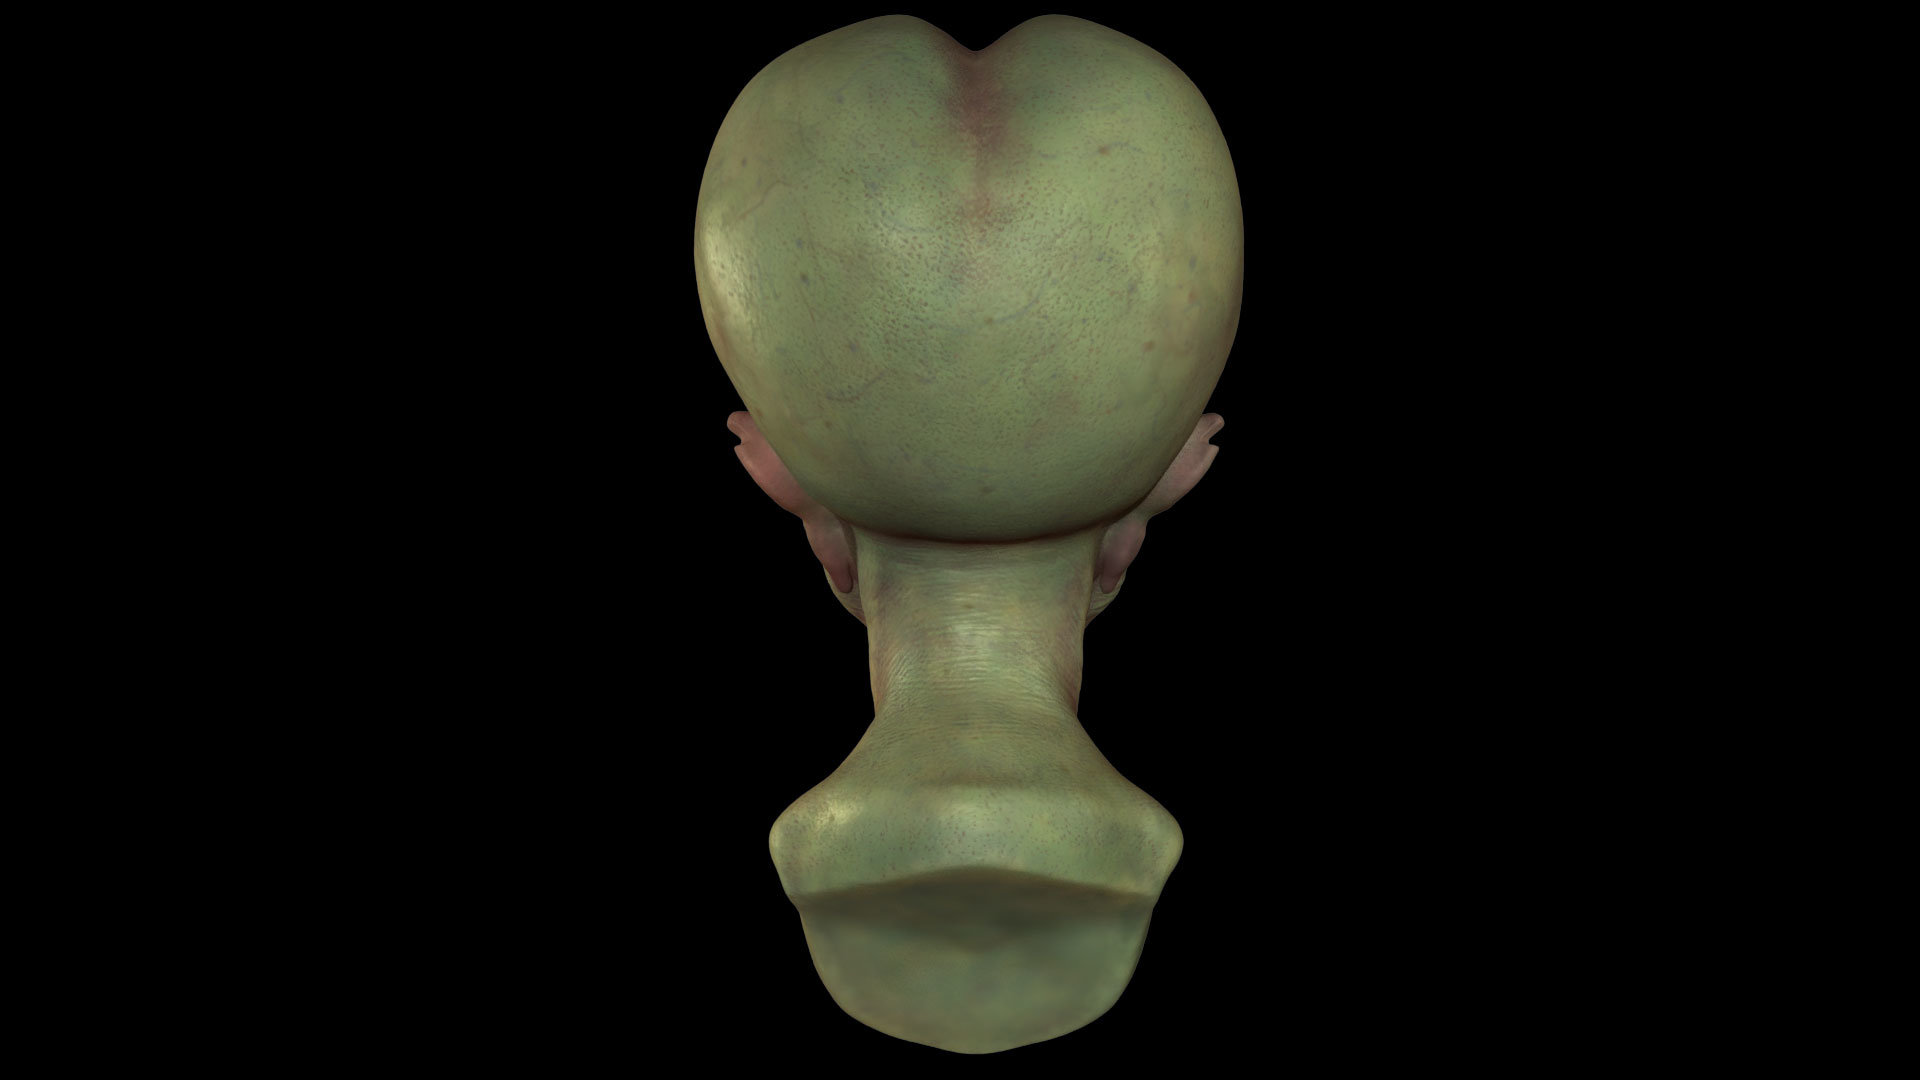 David chaney 04 alien back